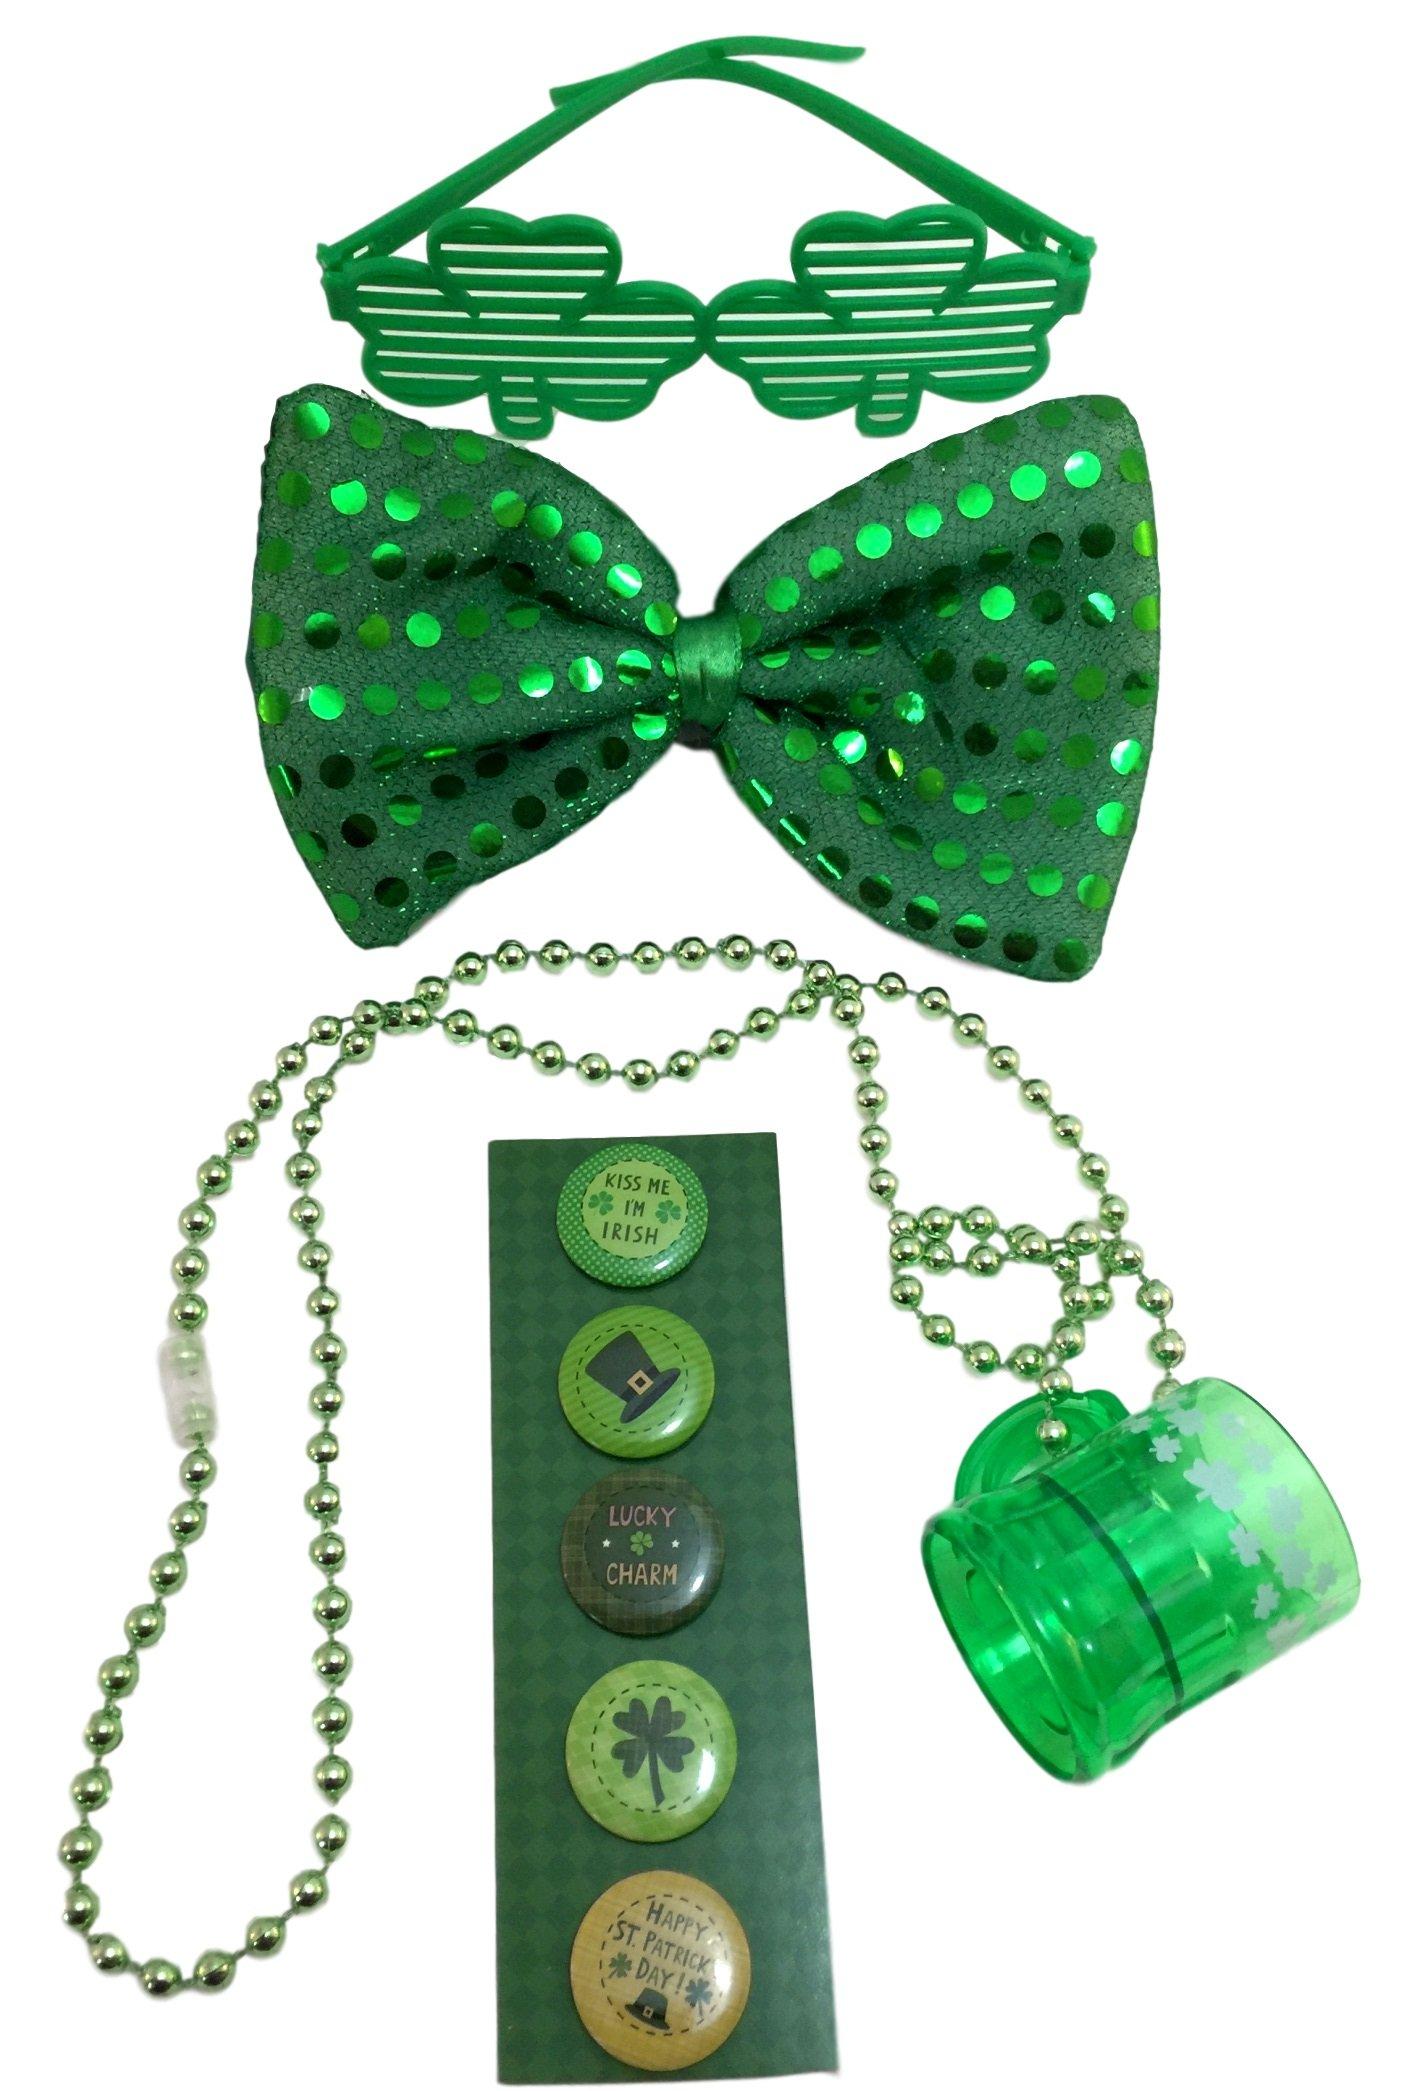 St Patricks Day Bundle-Sequin BowTie, Shuttered Shamrock Glasses, 5 Irish Buttons & Shot Glass Necklace